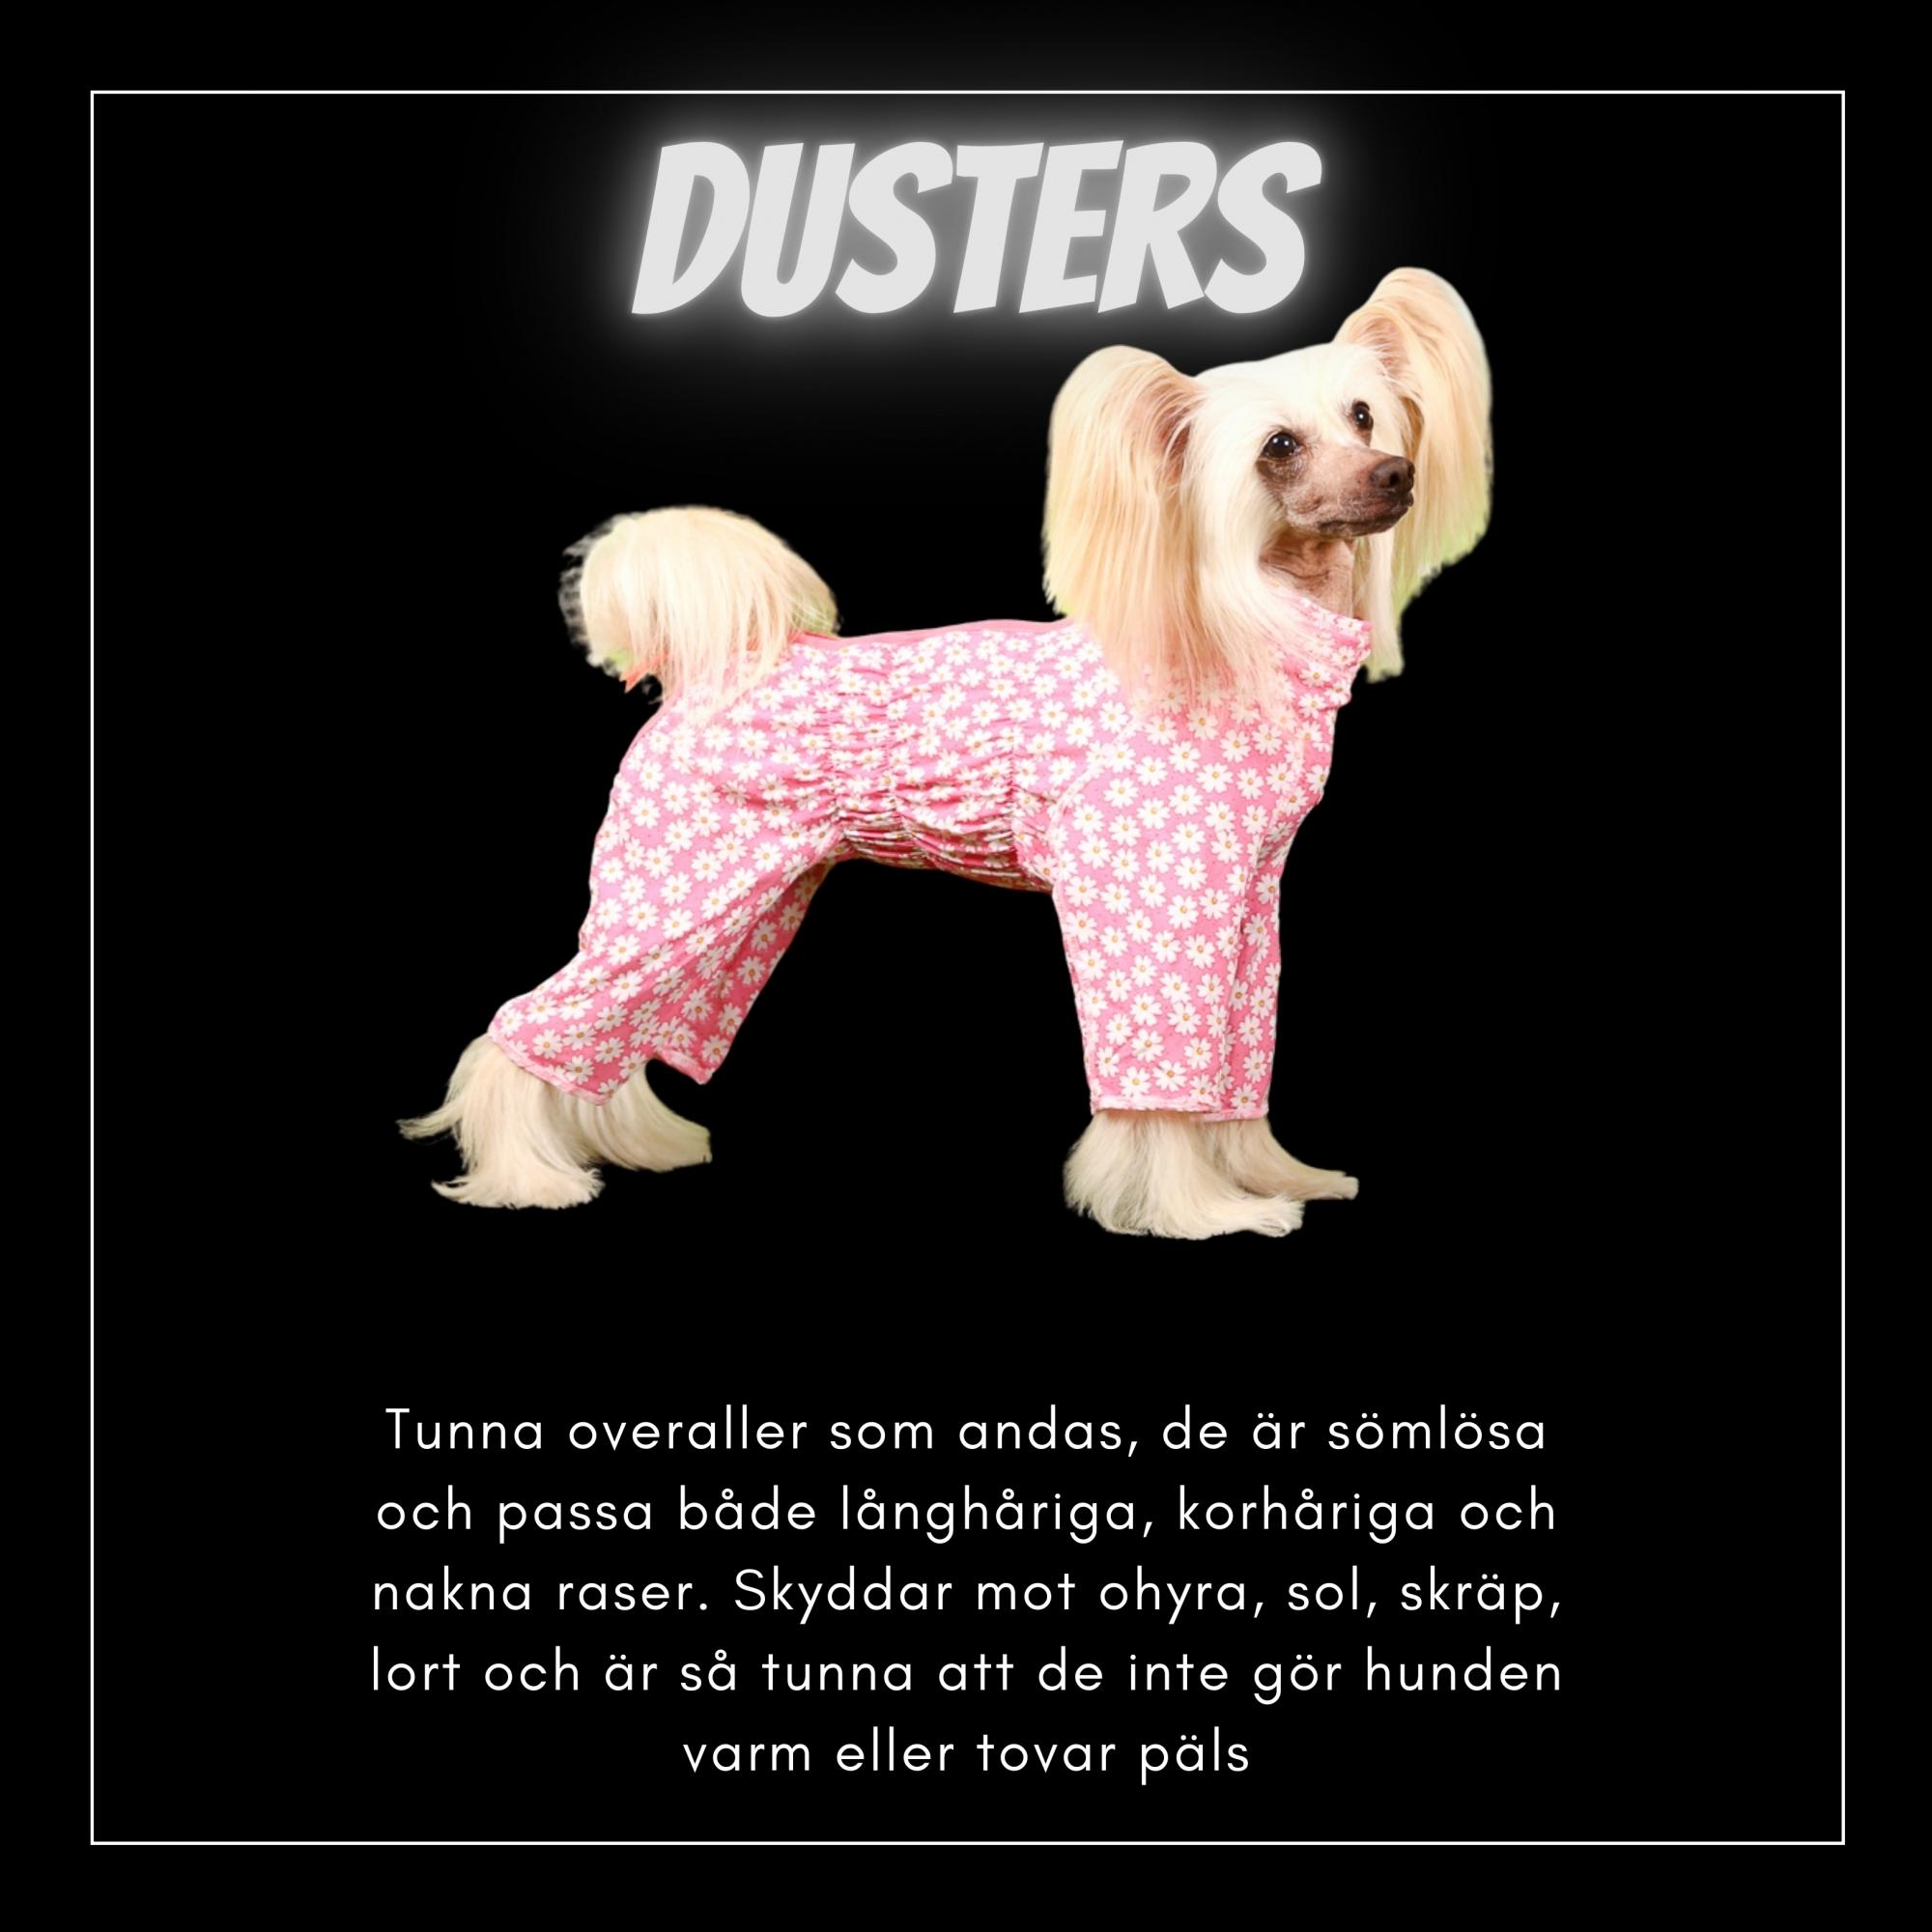 Dusters - Små hundar - Passion For Pet Fashion